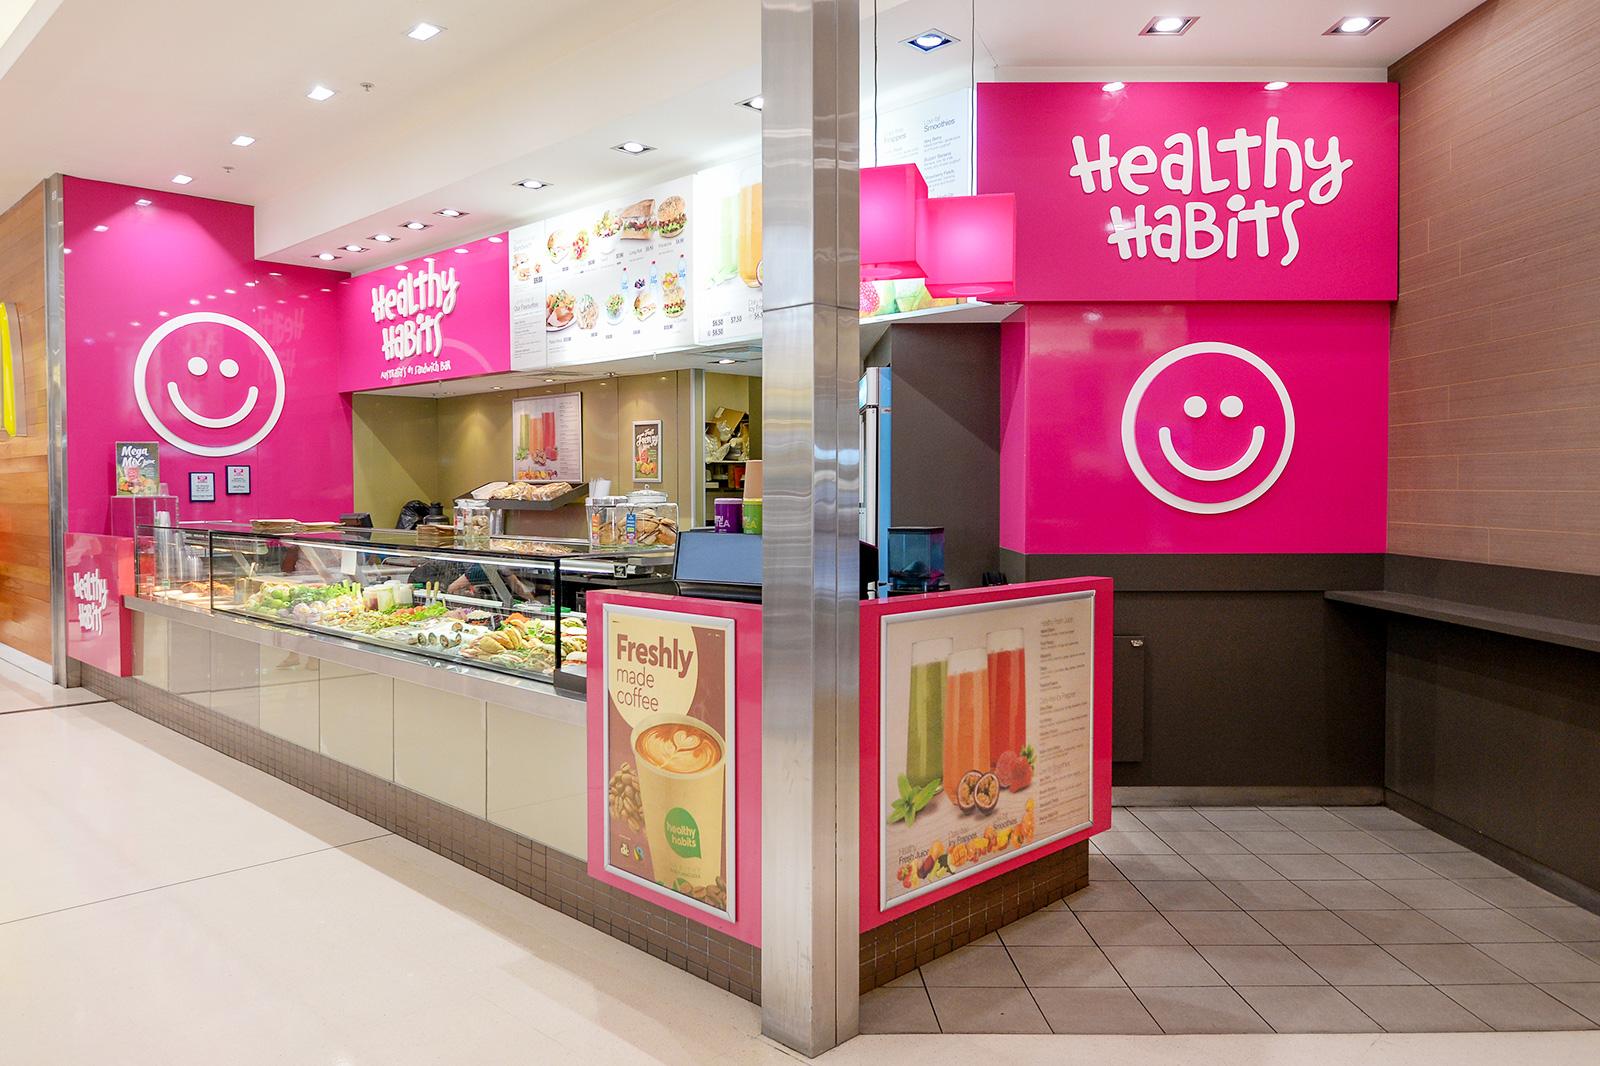 takeaway-sandwich-shop-healthy-habits-grafton-shopping-world-reduced-price-4